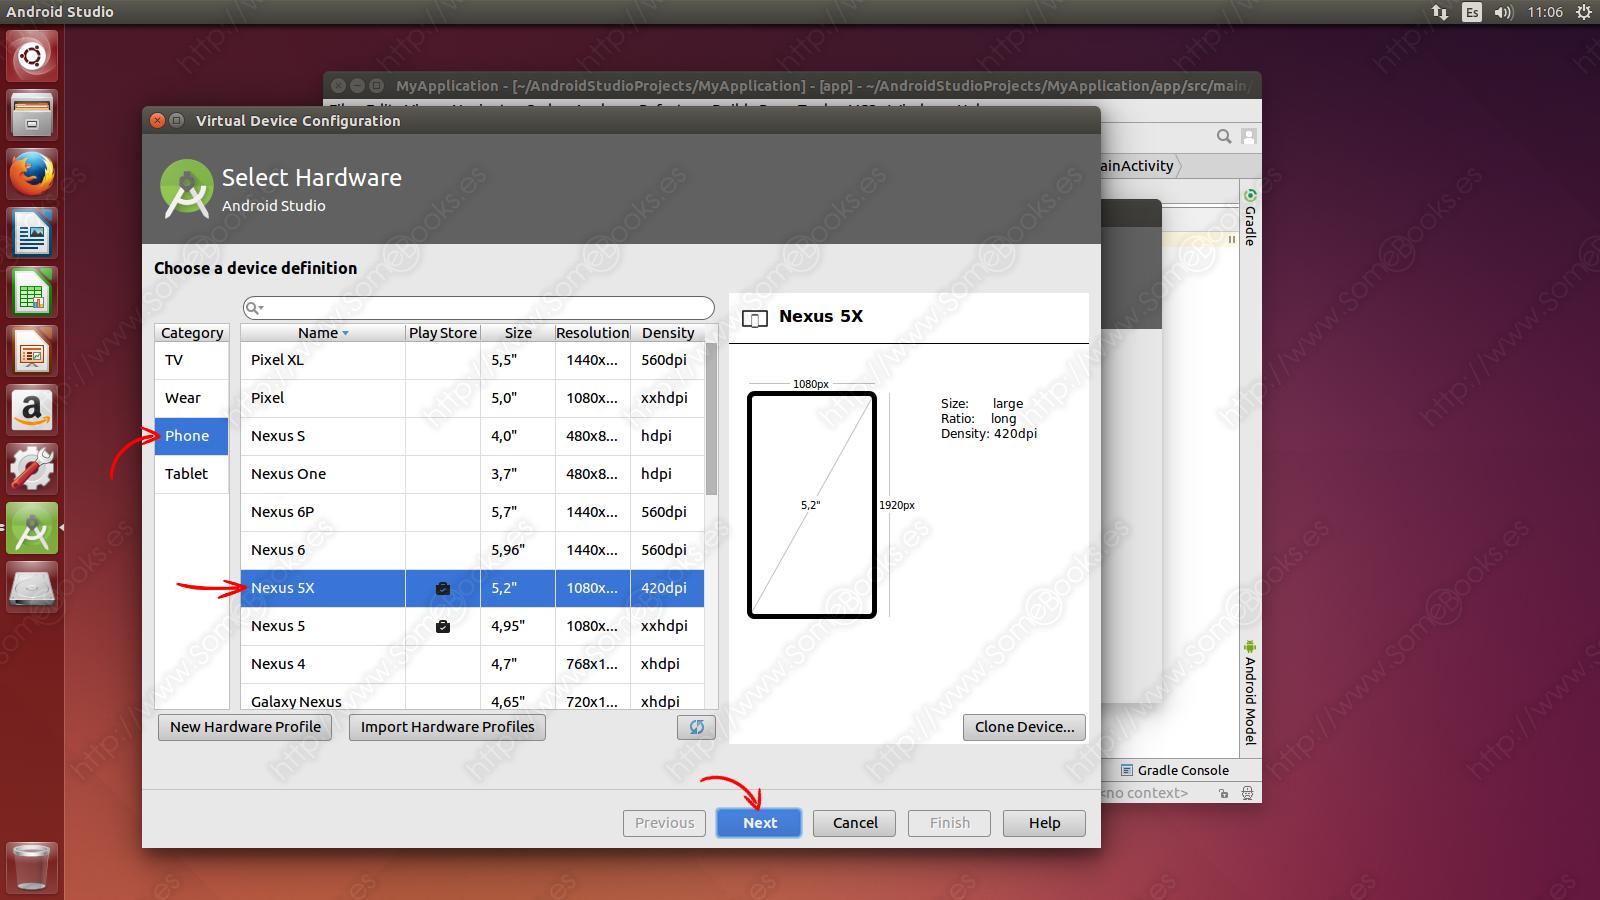 Crear-un-emulador-de-Android-con-Android-Studio-004